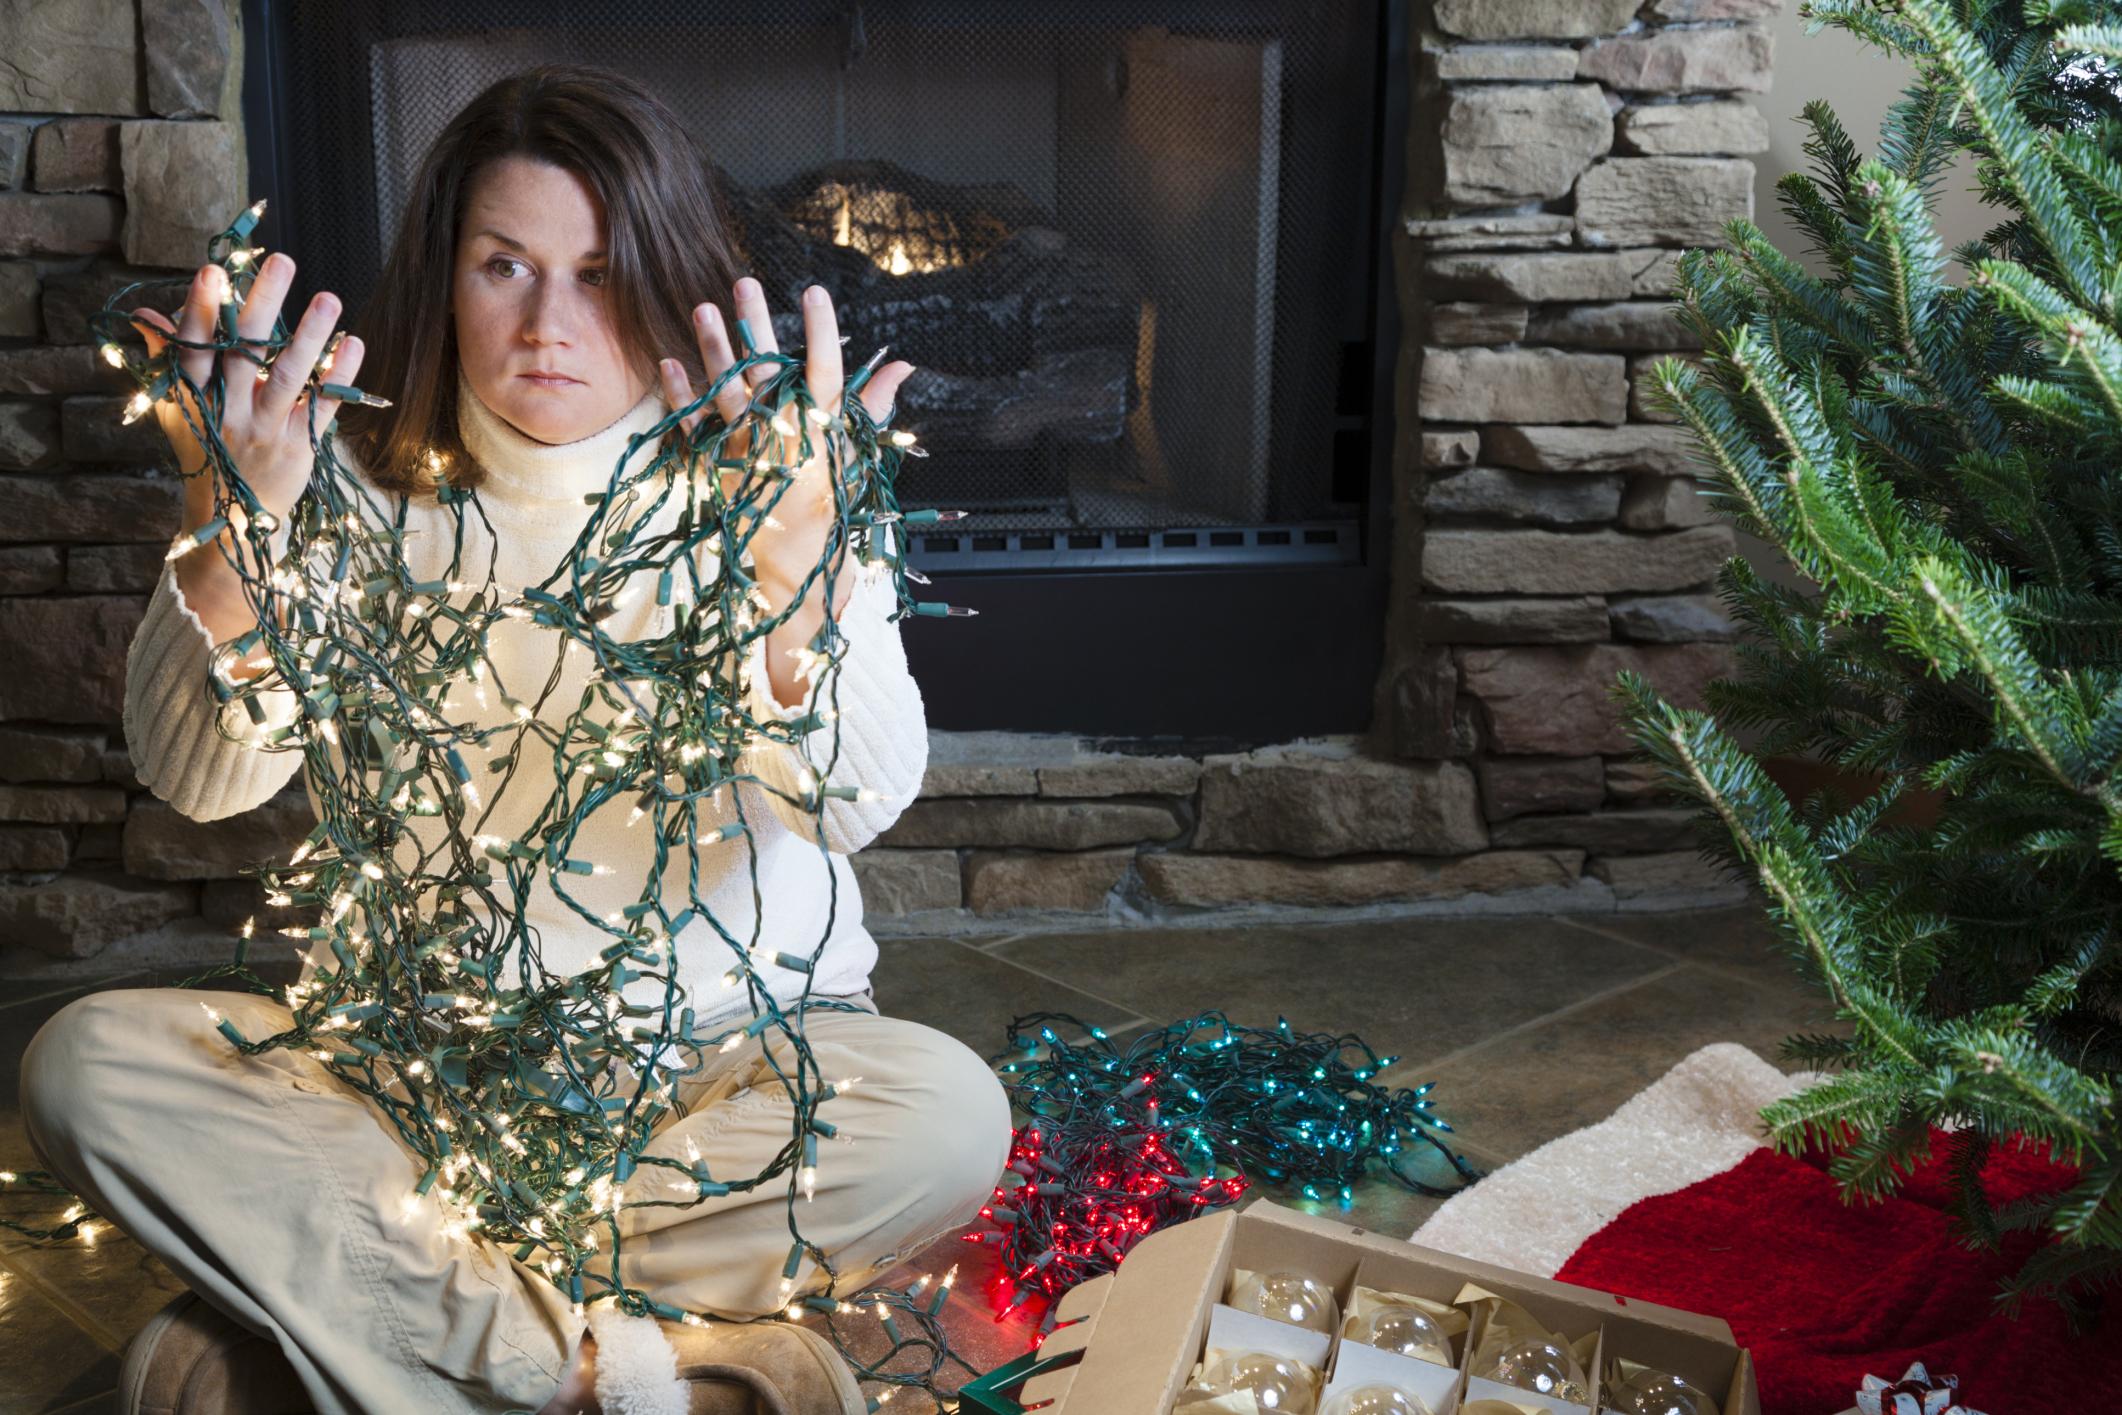 Ho, Ho, Ho humbug: What has us feeling like grinches during the holidays